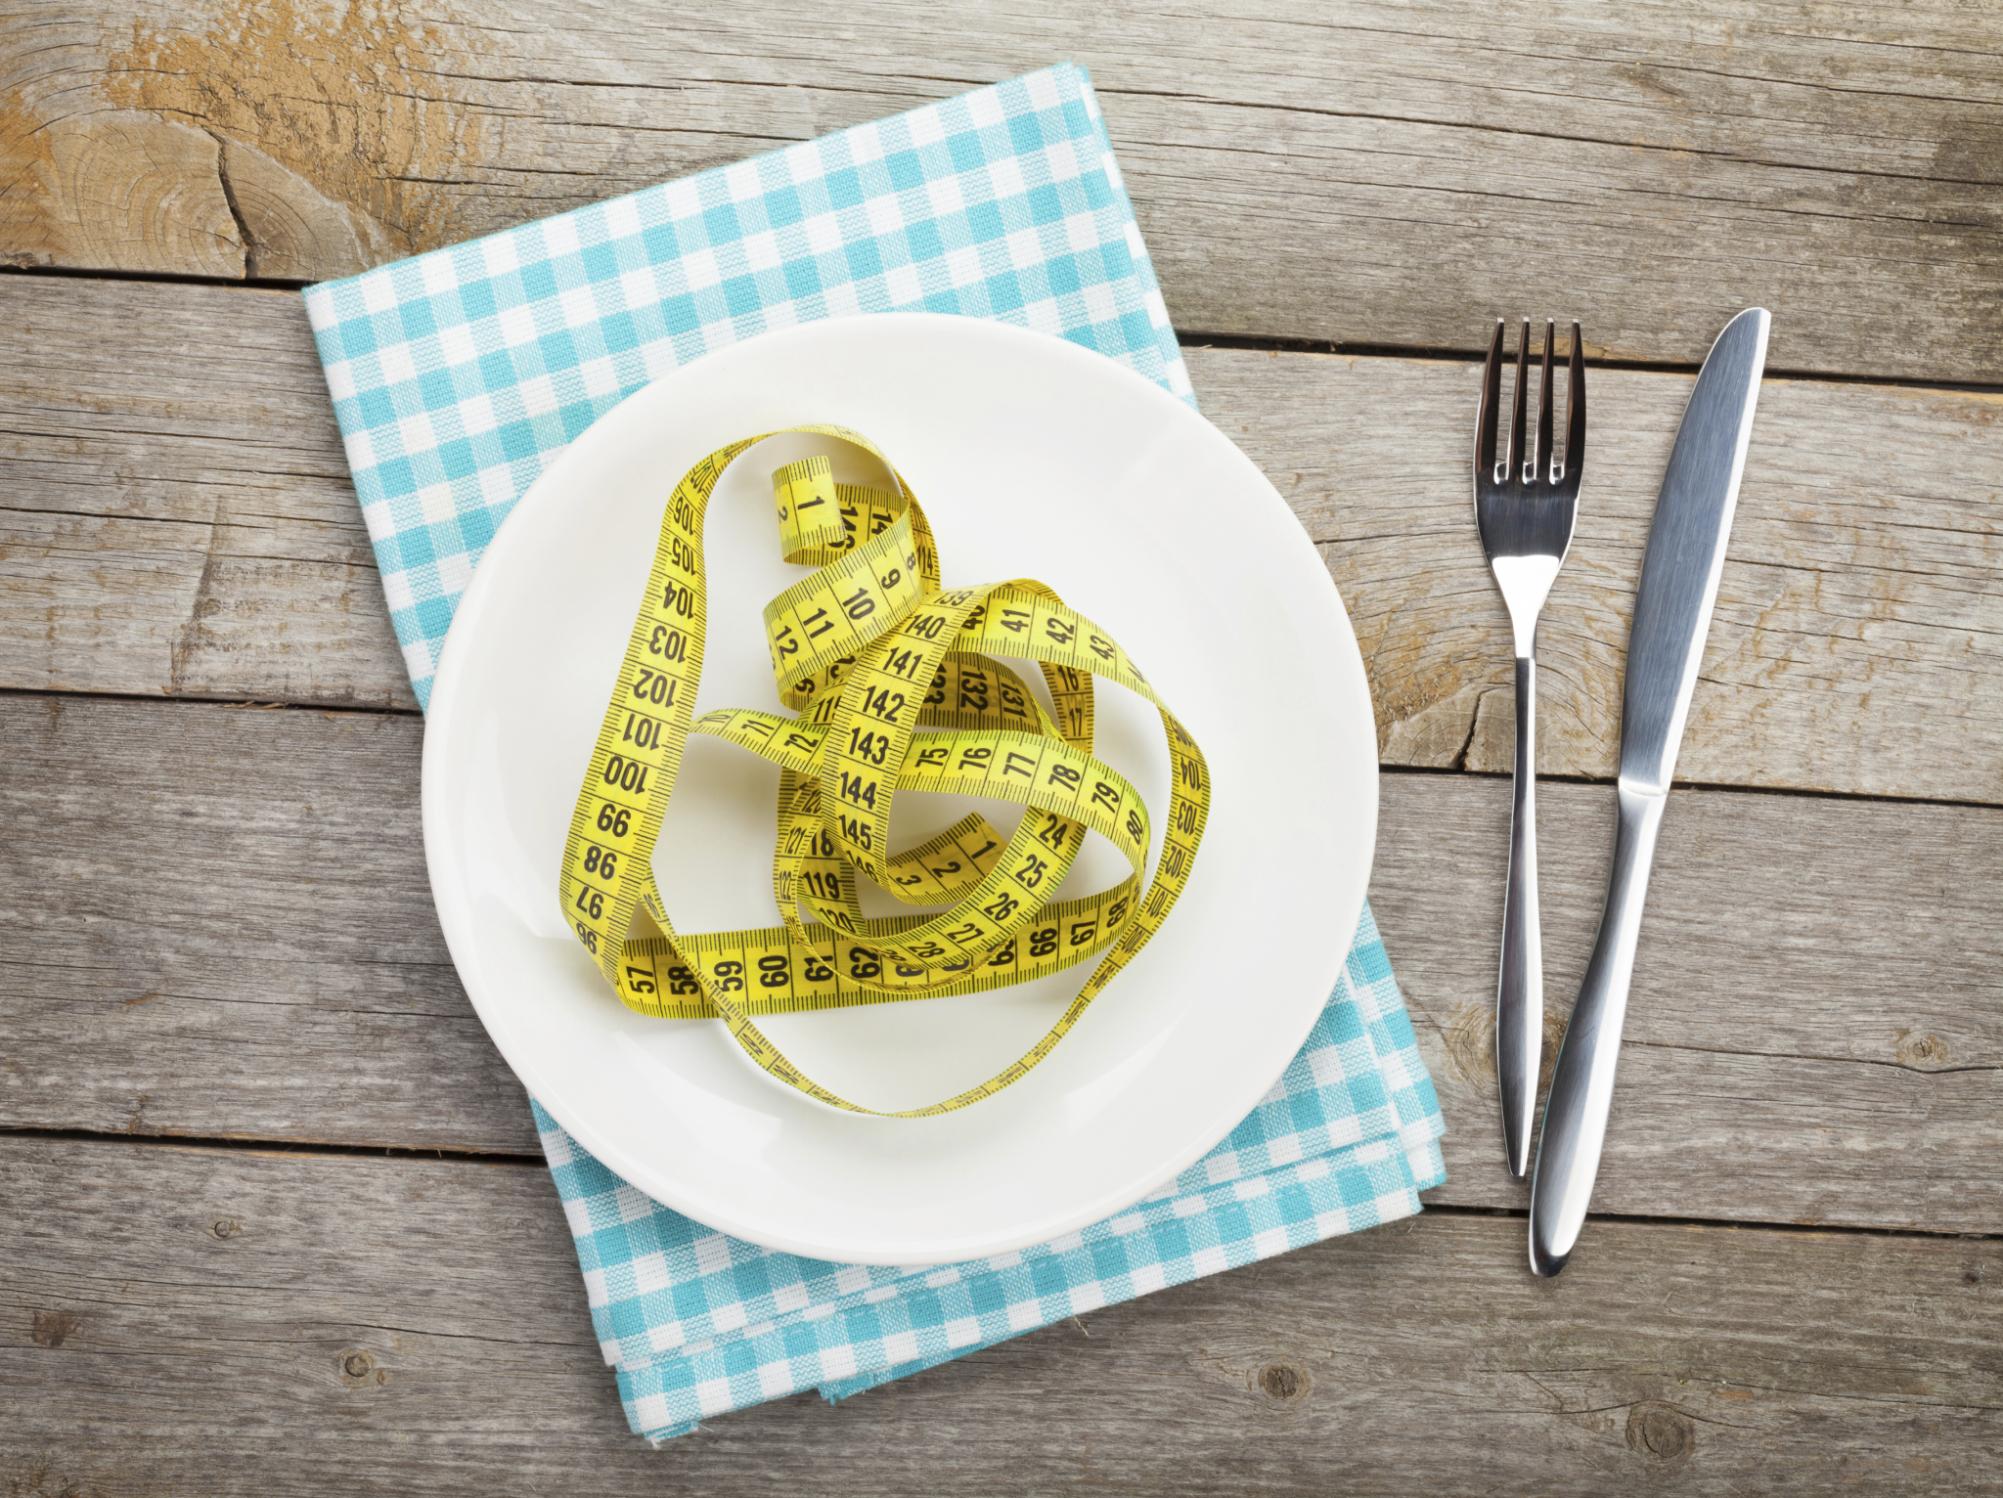 weight loss 4 idiots diet generator diet